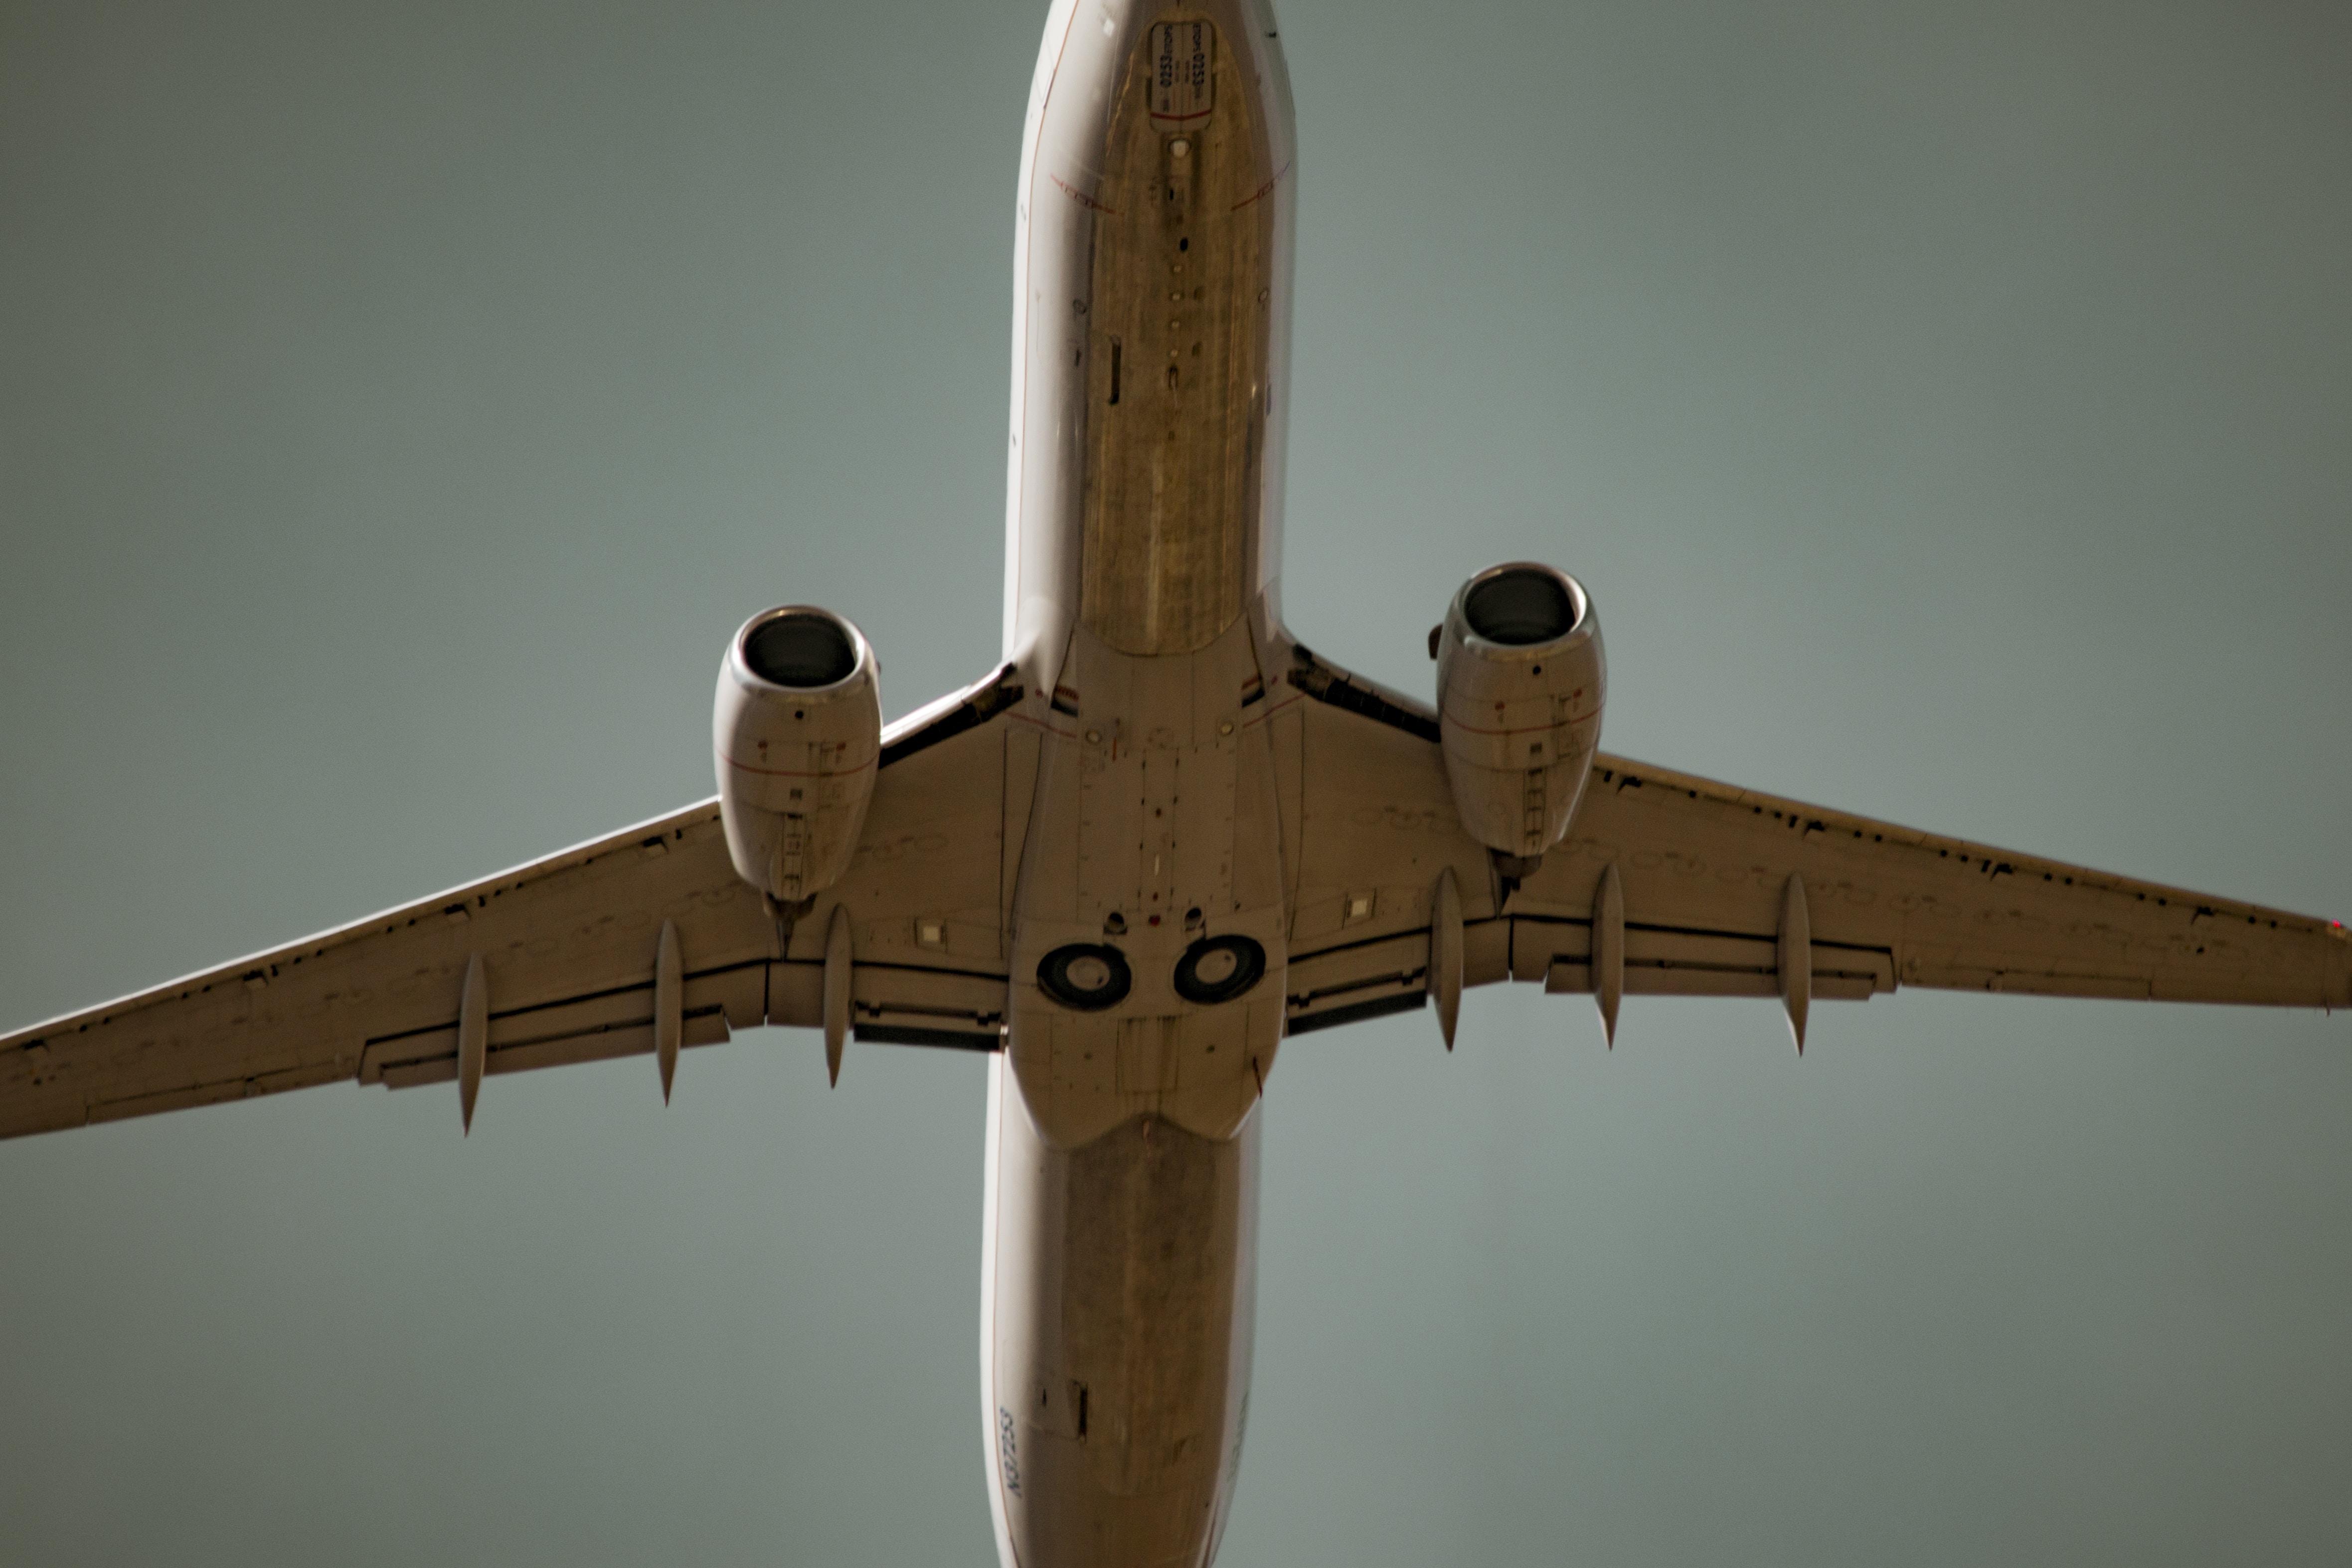 Underside of an airplane flying overhead